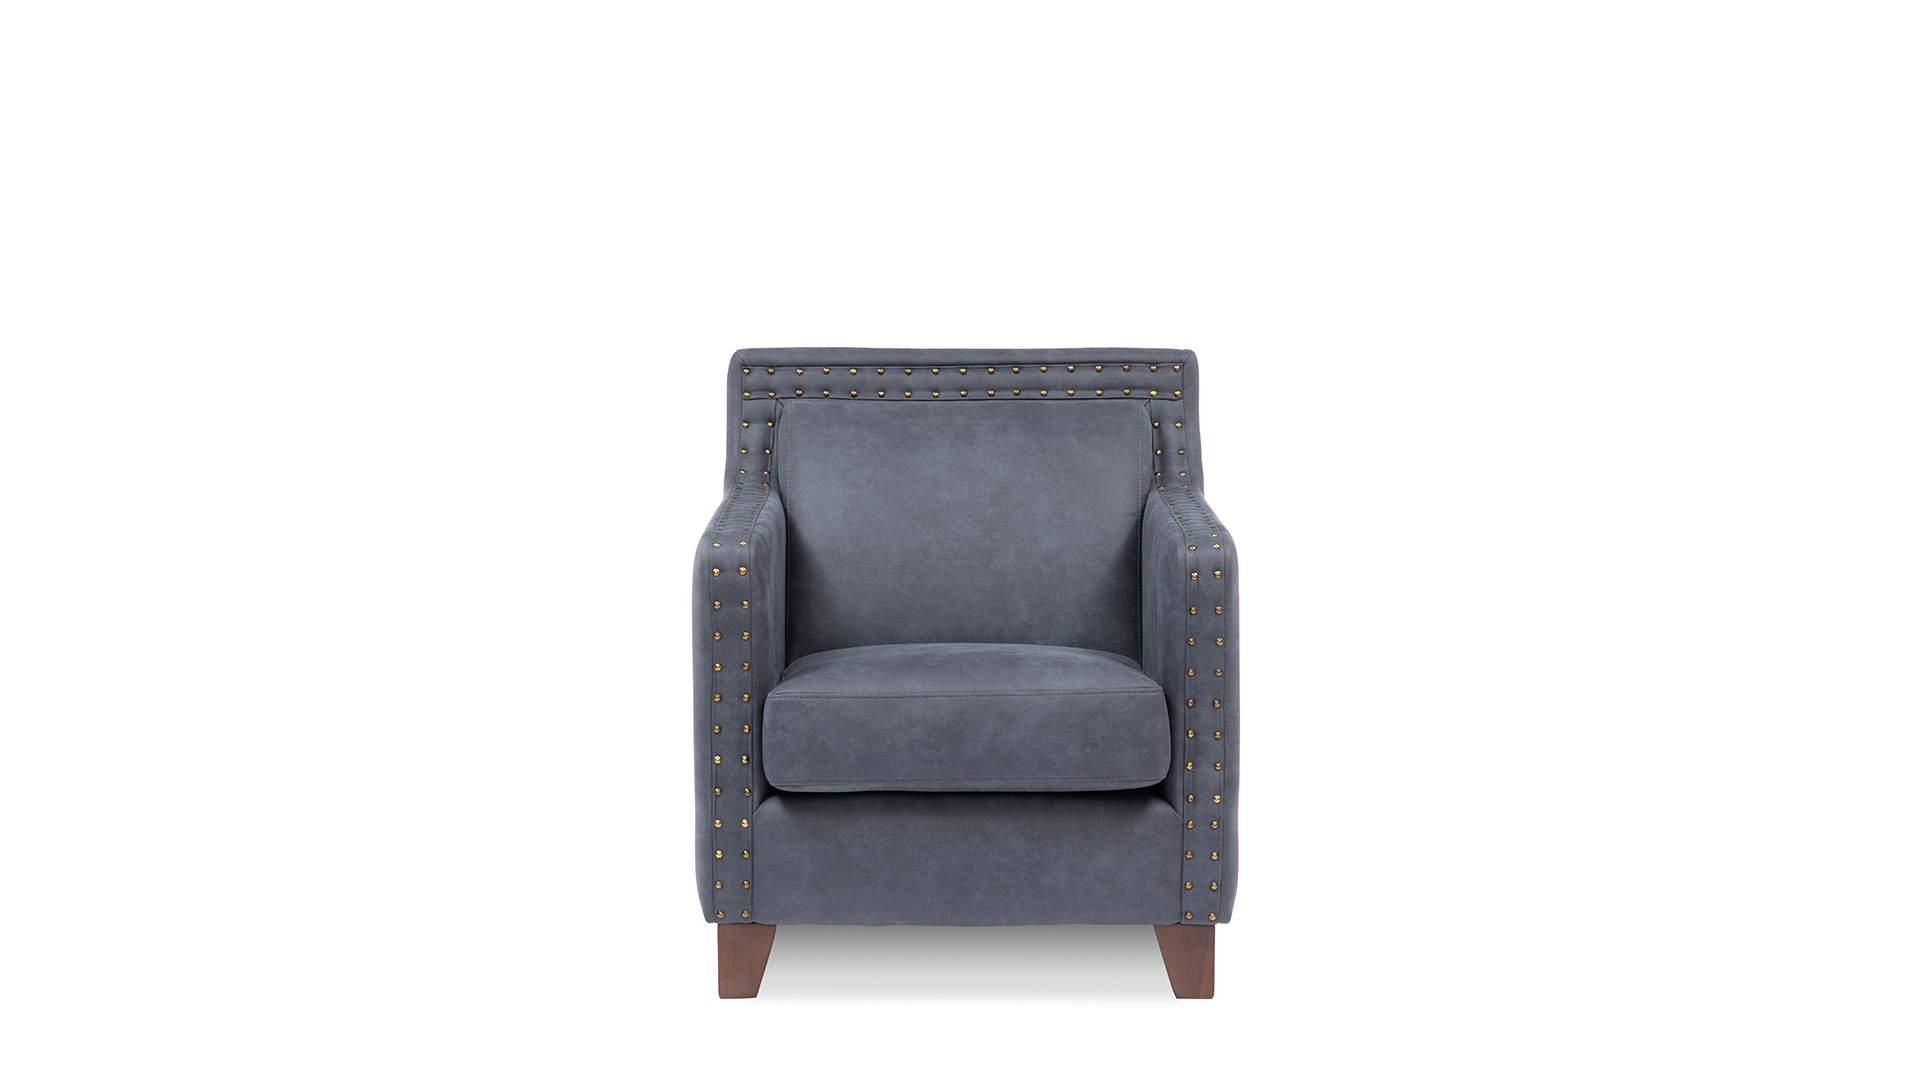 Кресло Палермо 670x820x780